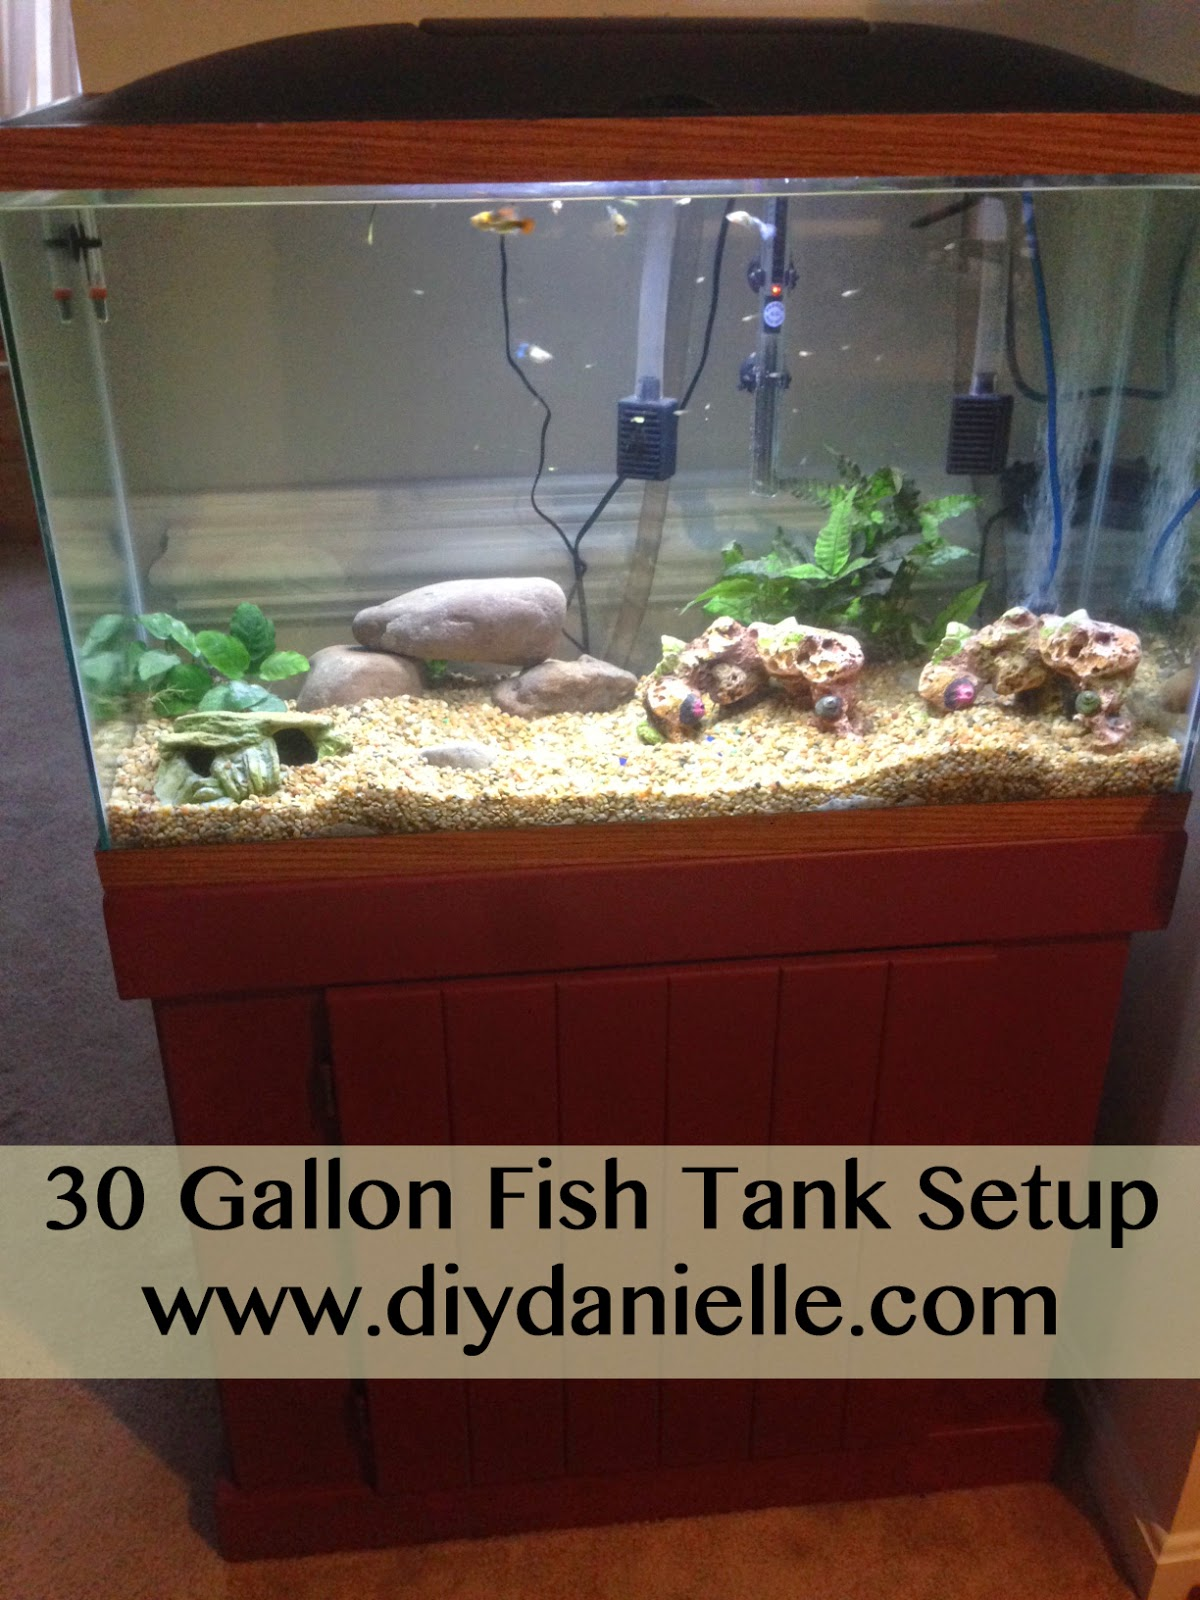 30 gallon fish tank setup diy danielle for 10 gallon fish tank dimensions